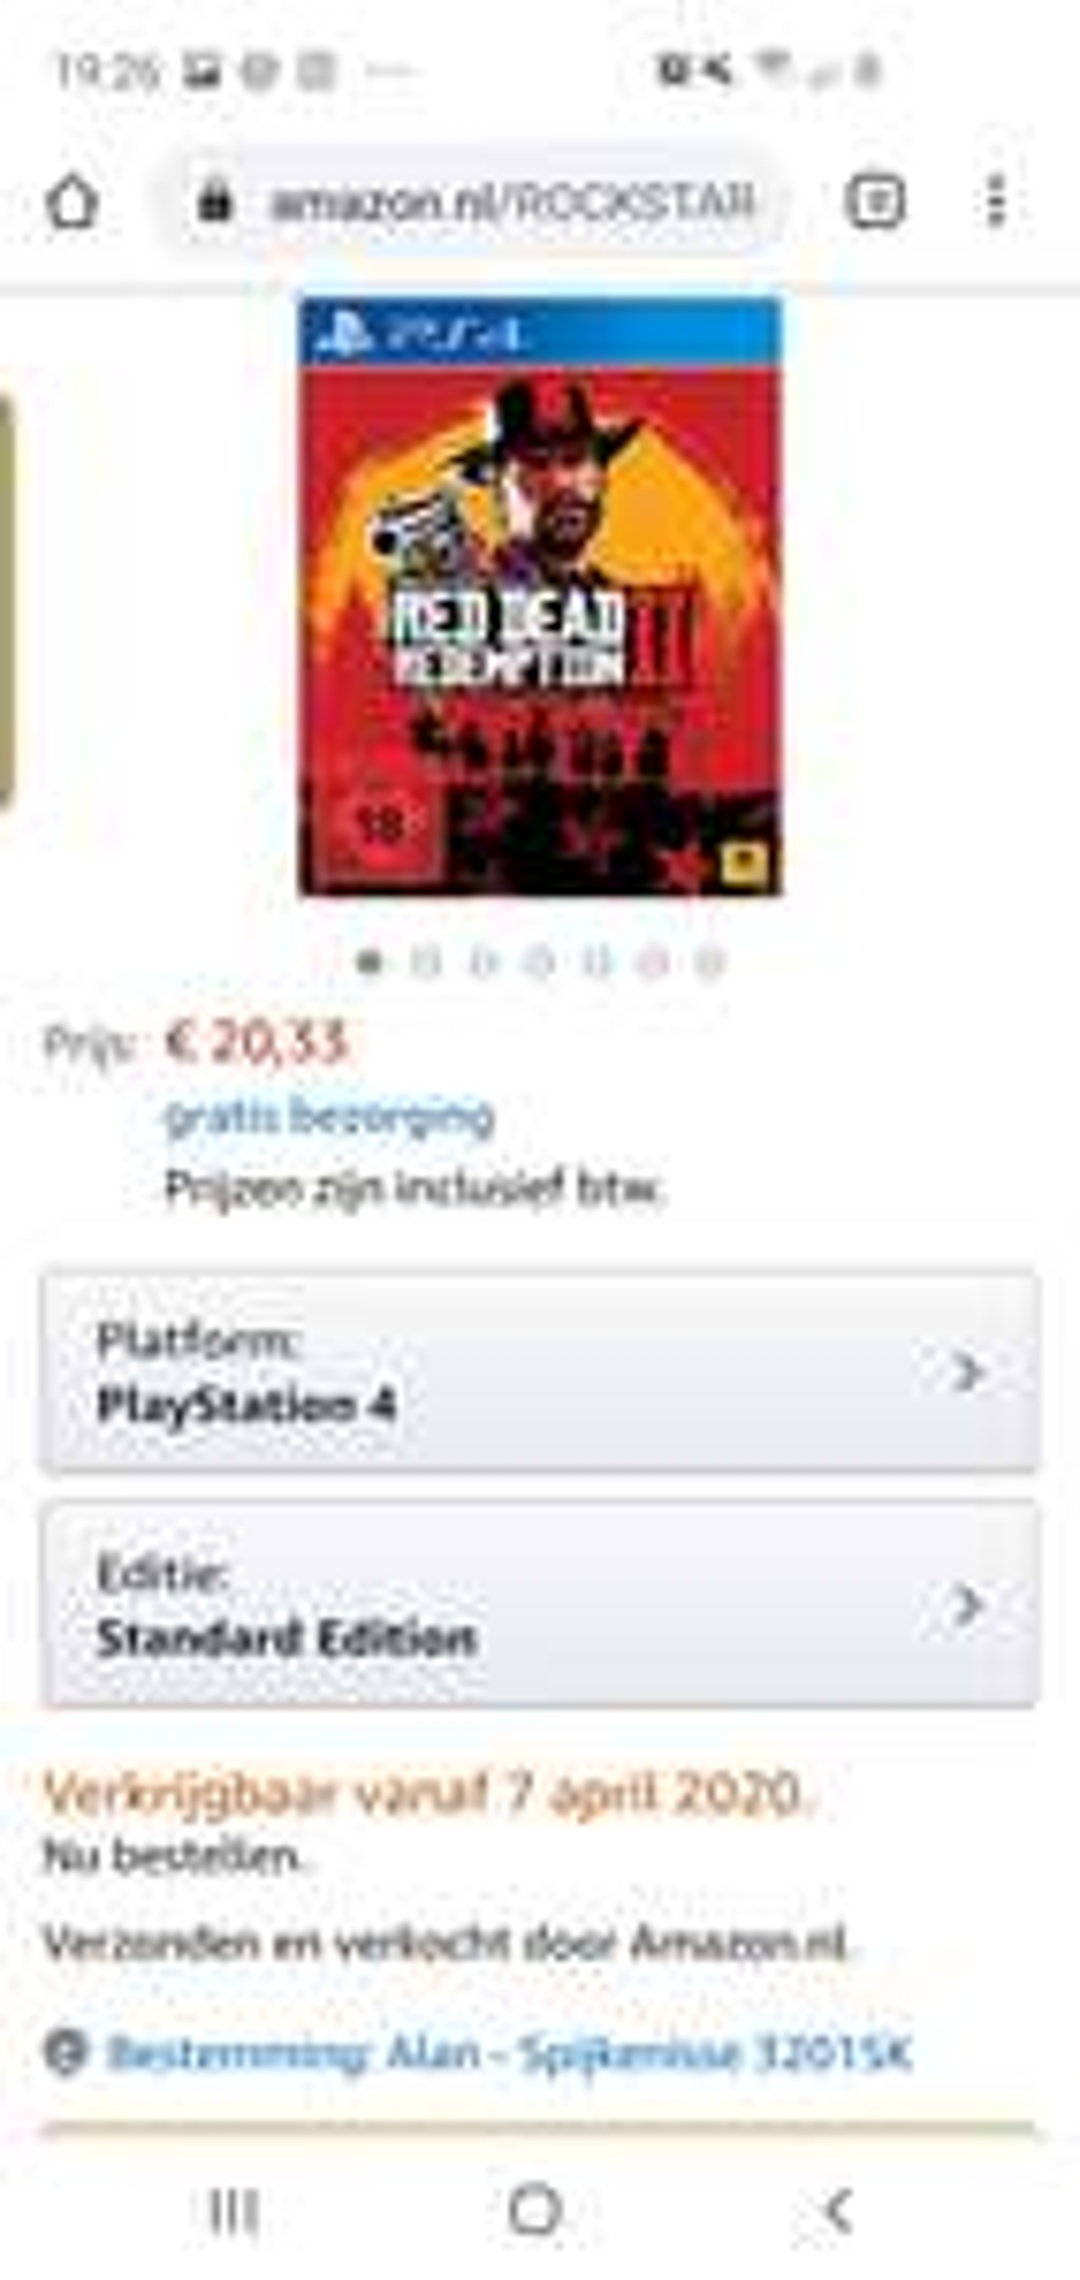 Red dead redemption 2 ps4 inclusief verzendkosten